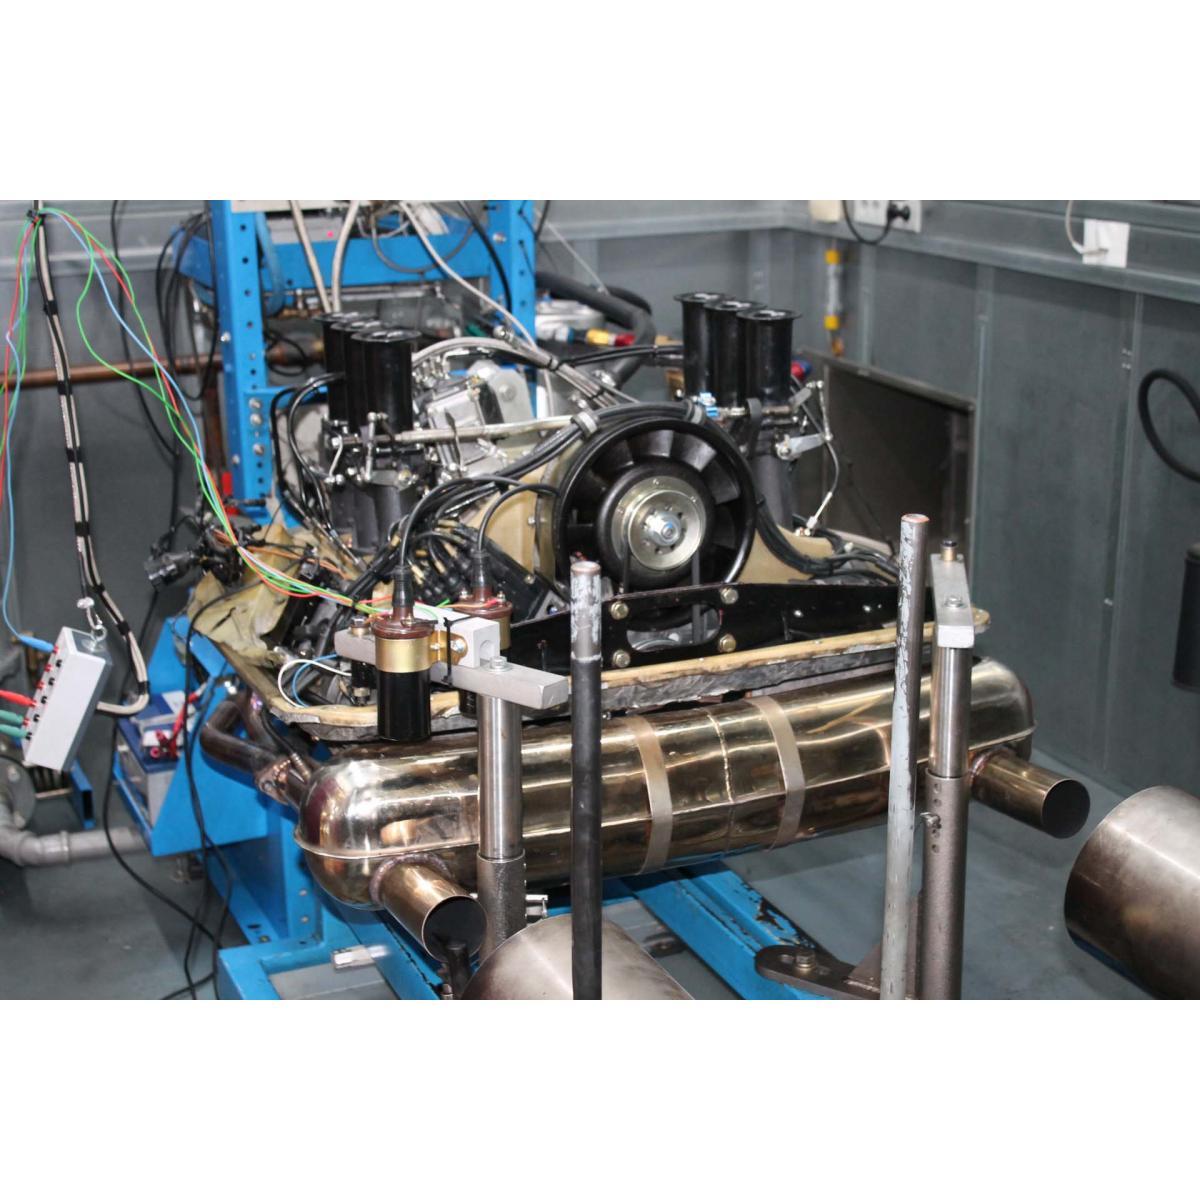 Motor komplett, 2,5 ST, Rundstrecke, MFI, 290 PS/ 258 Nm